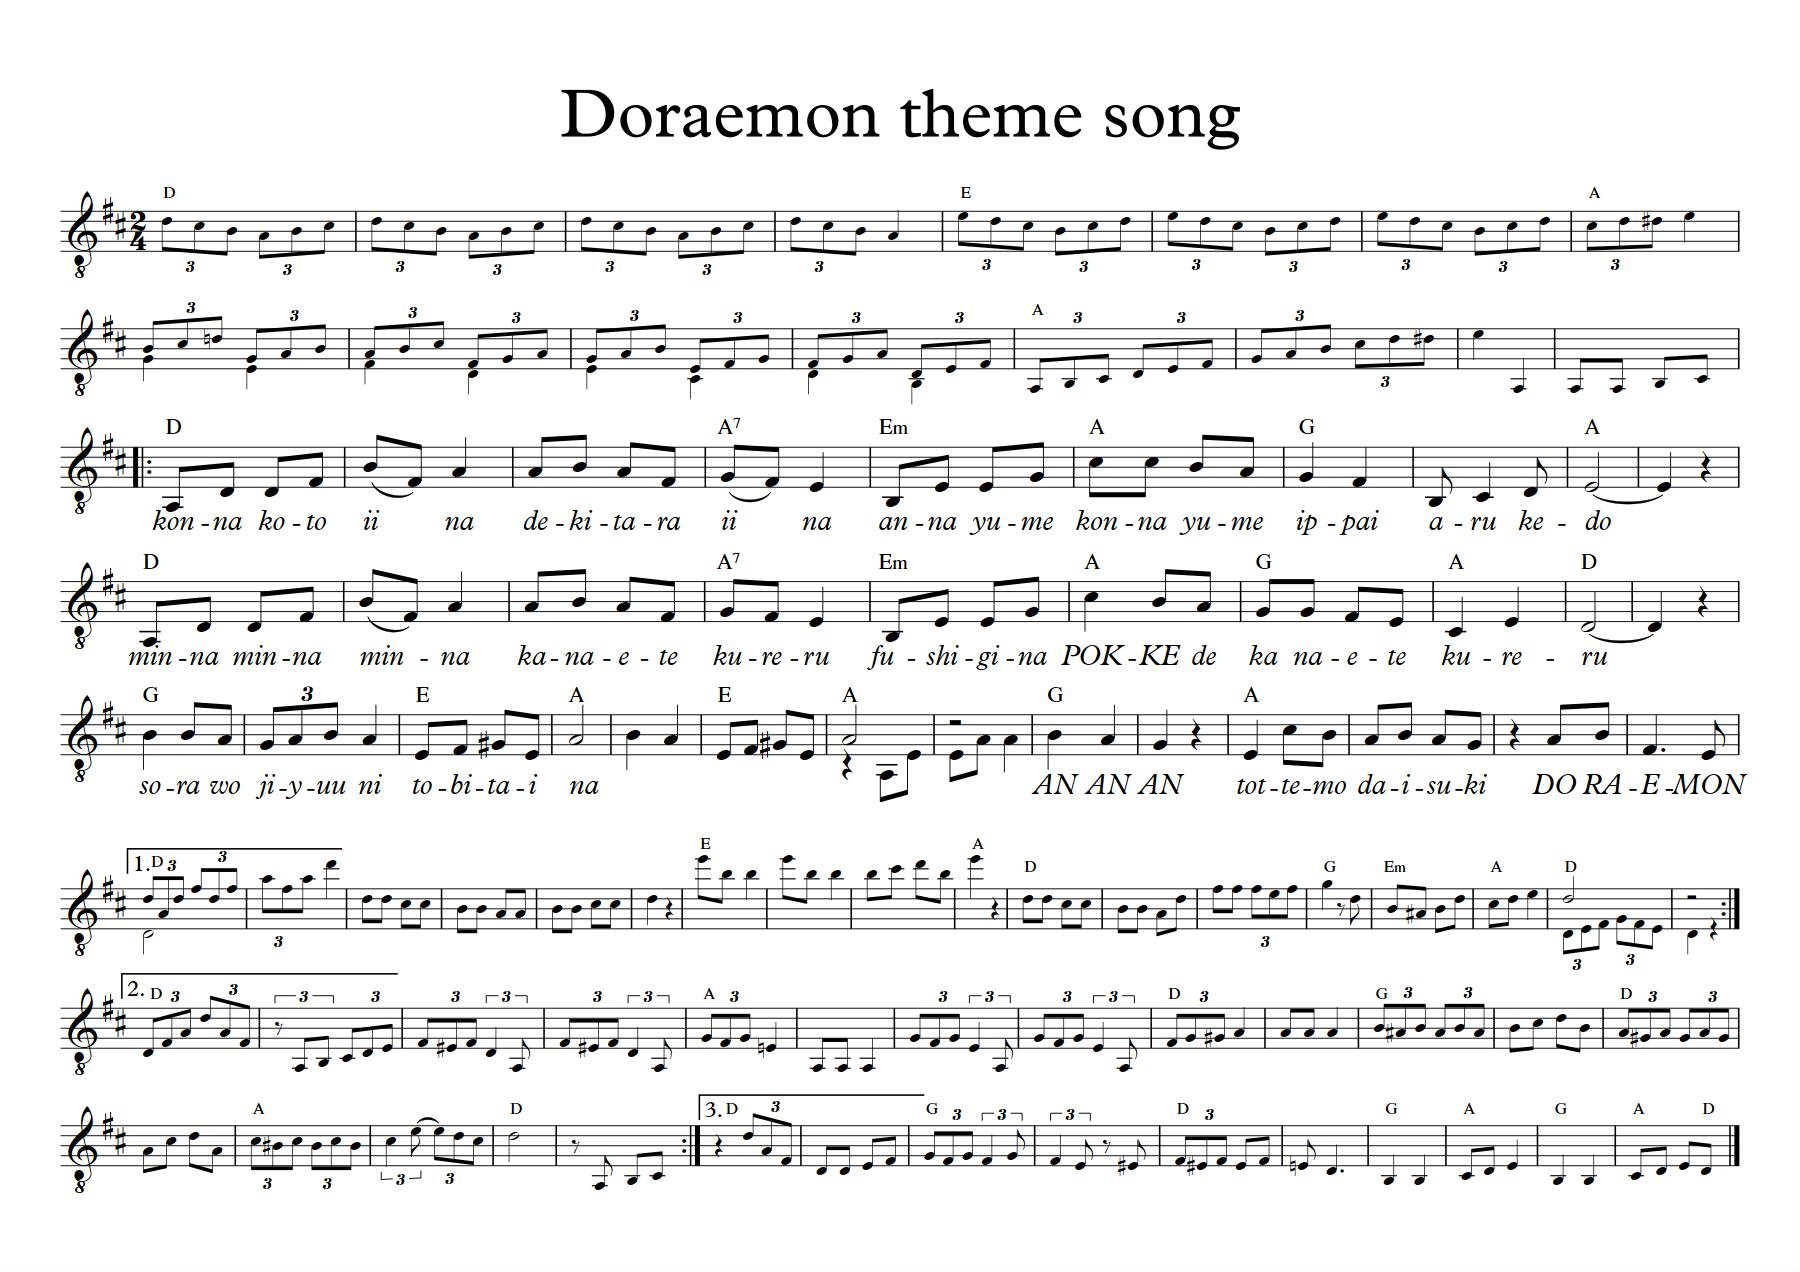 Sheet music Doraemon theme song.png